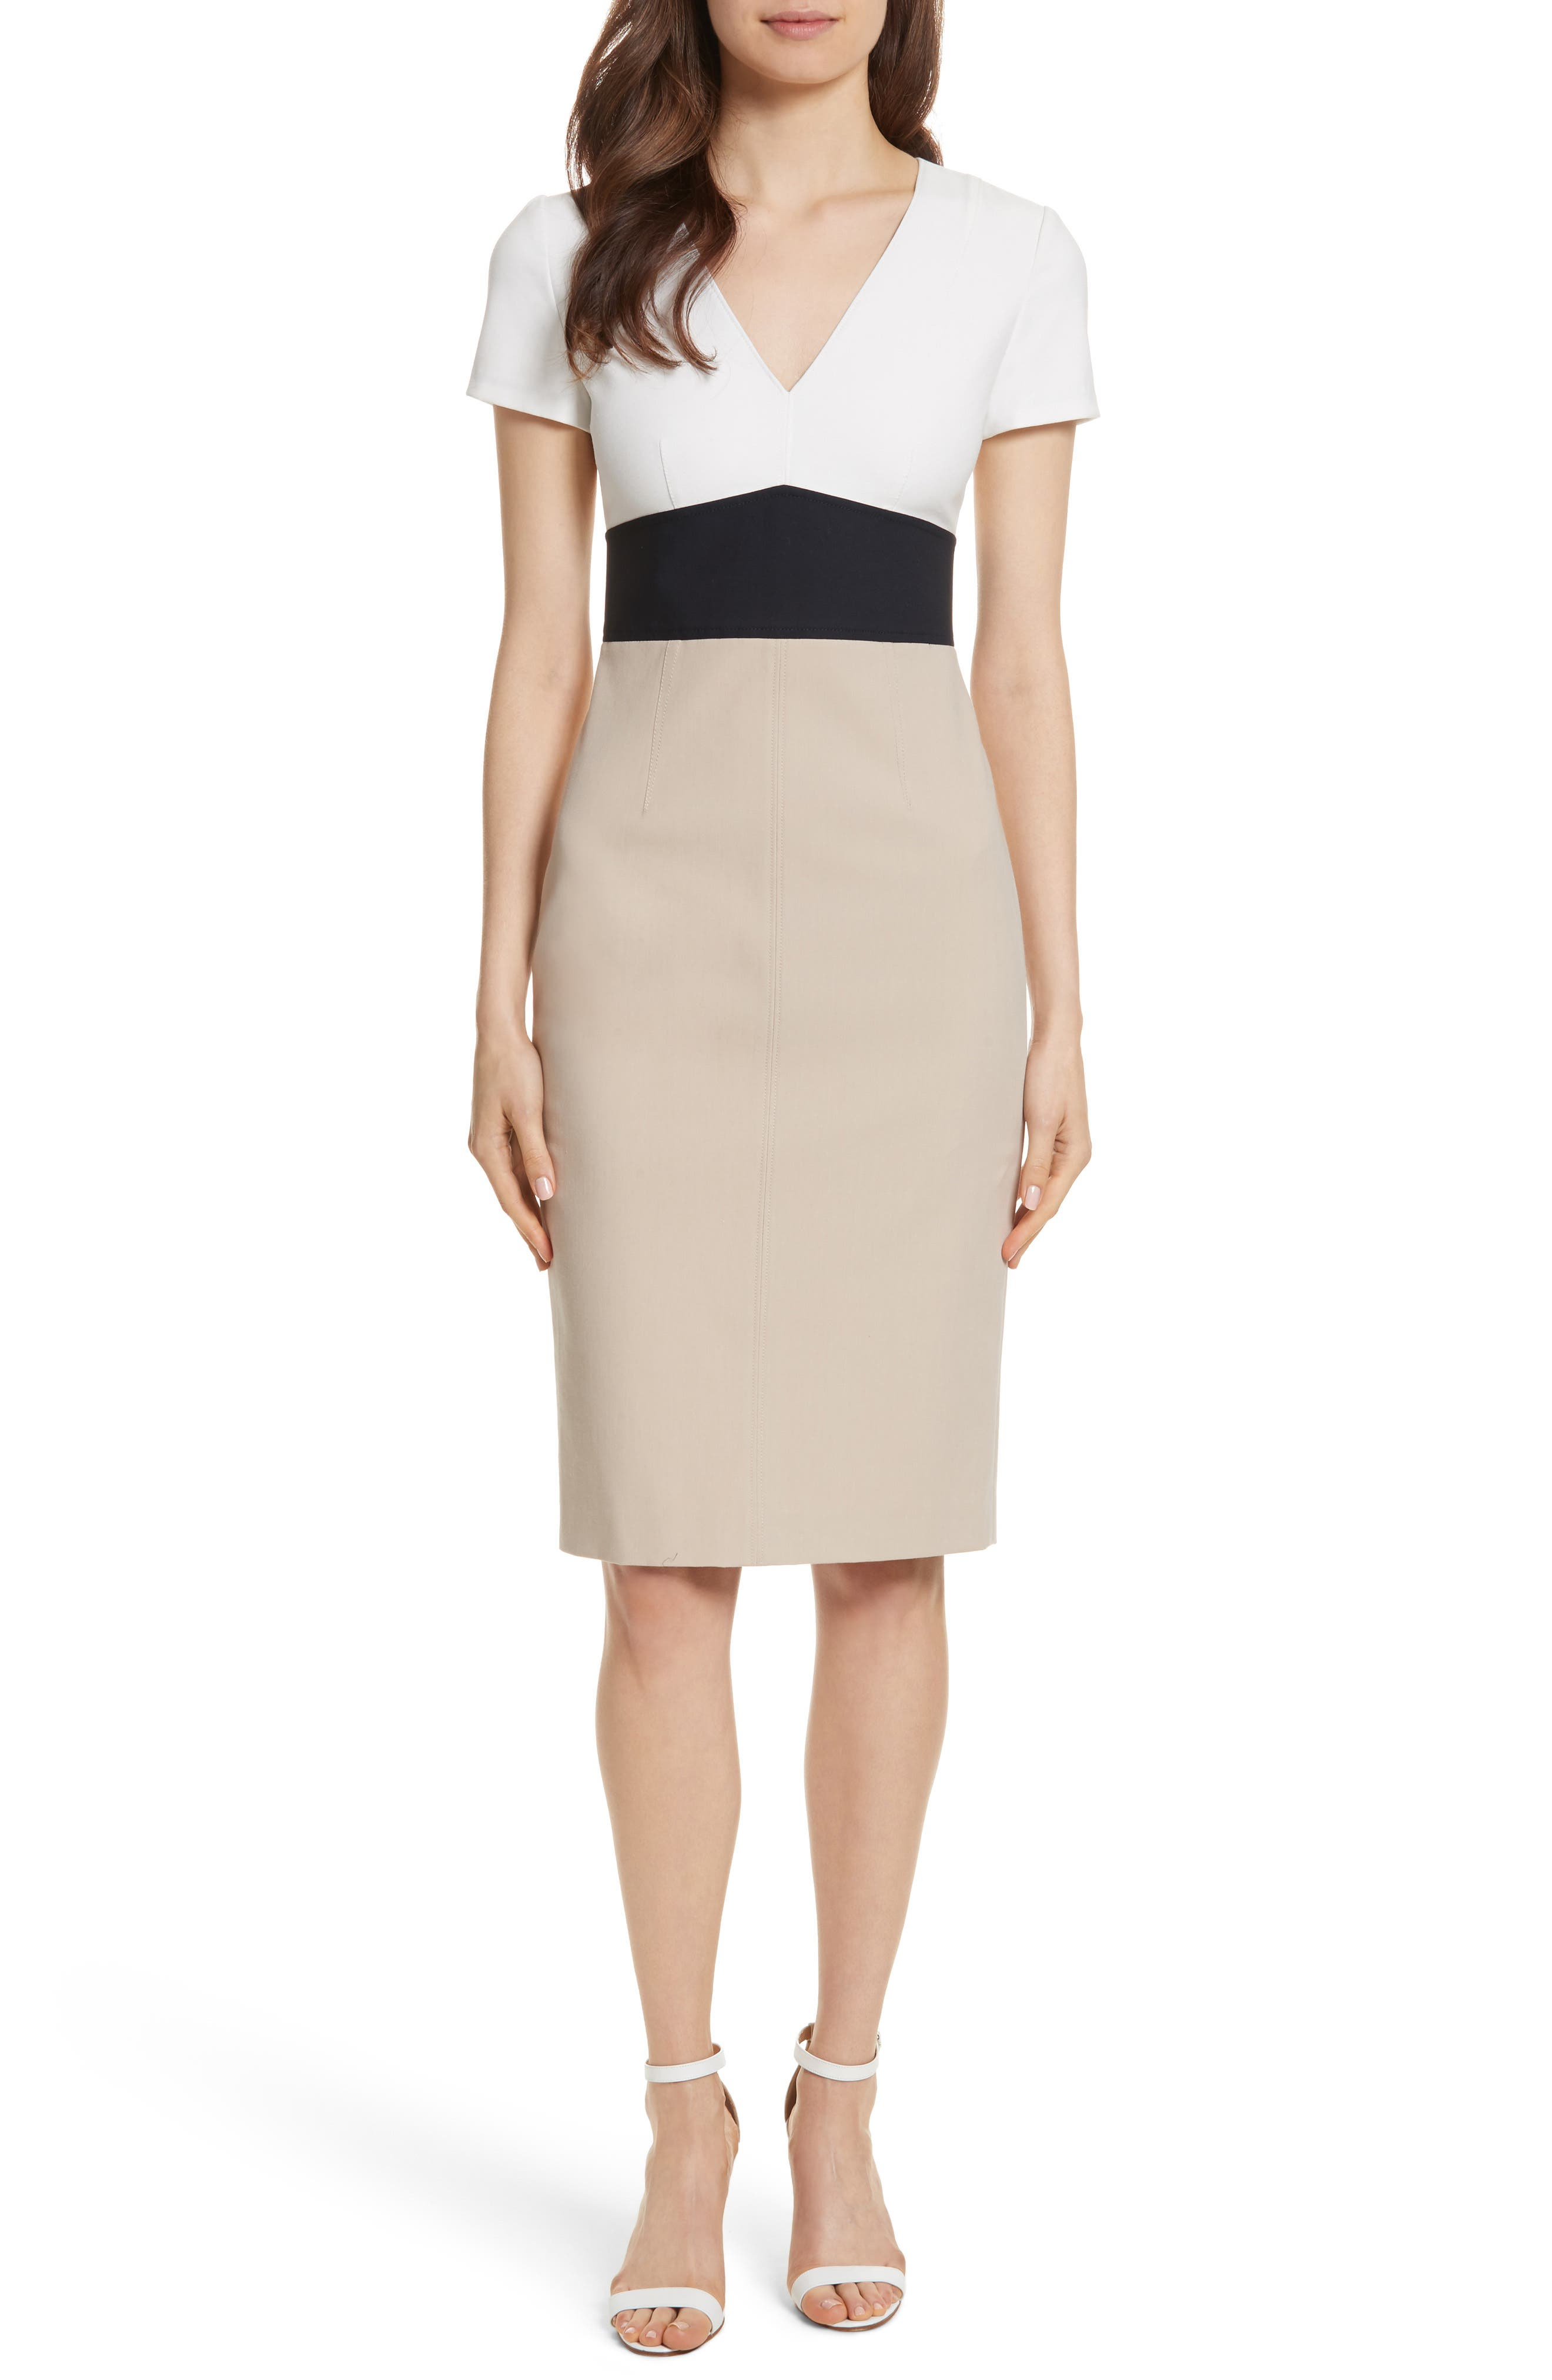 Diane von Furstenberg Colorblock Stretch Cotton Blend Sheath Dress,                         Main,                         color, Sand/ Alexander Navy/ White